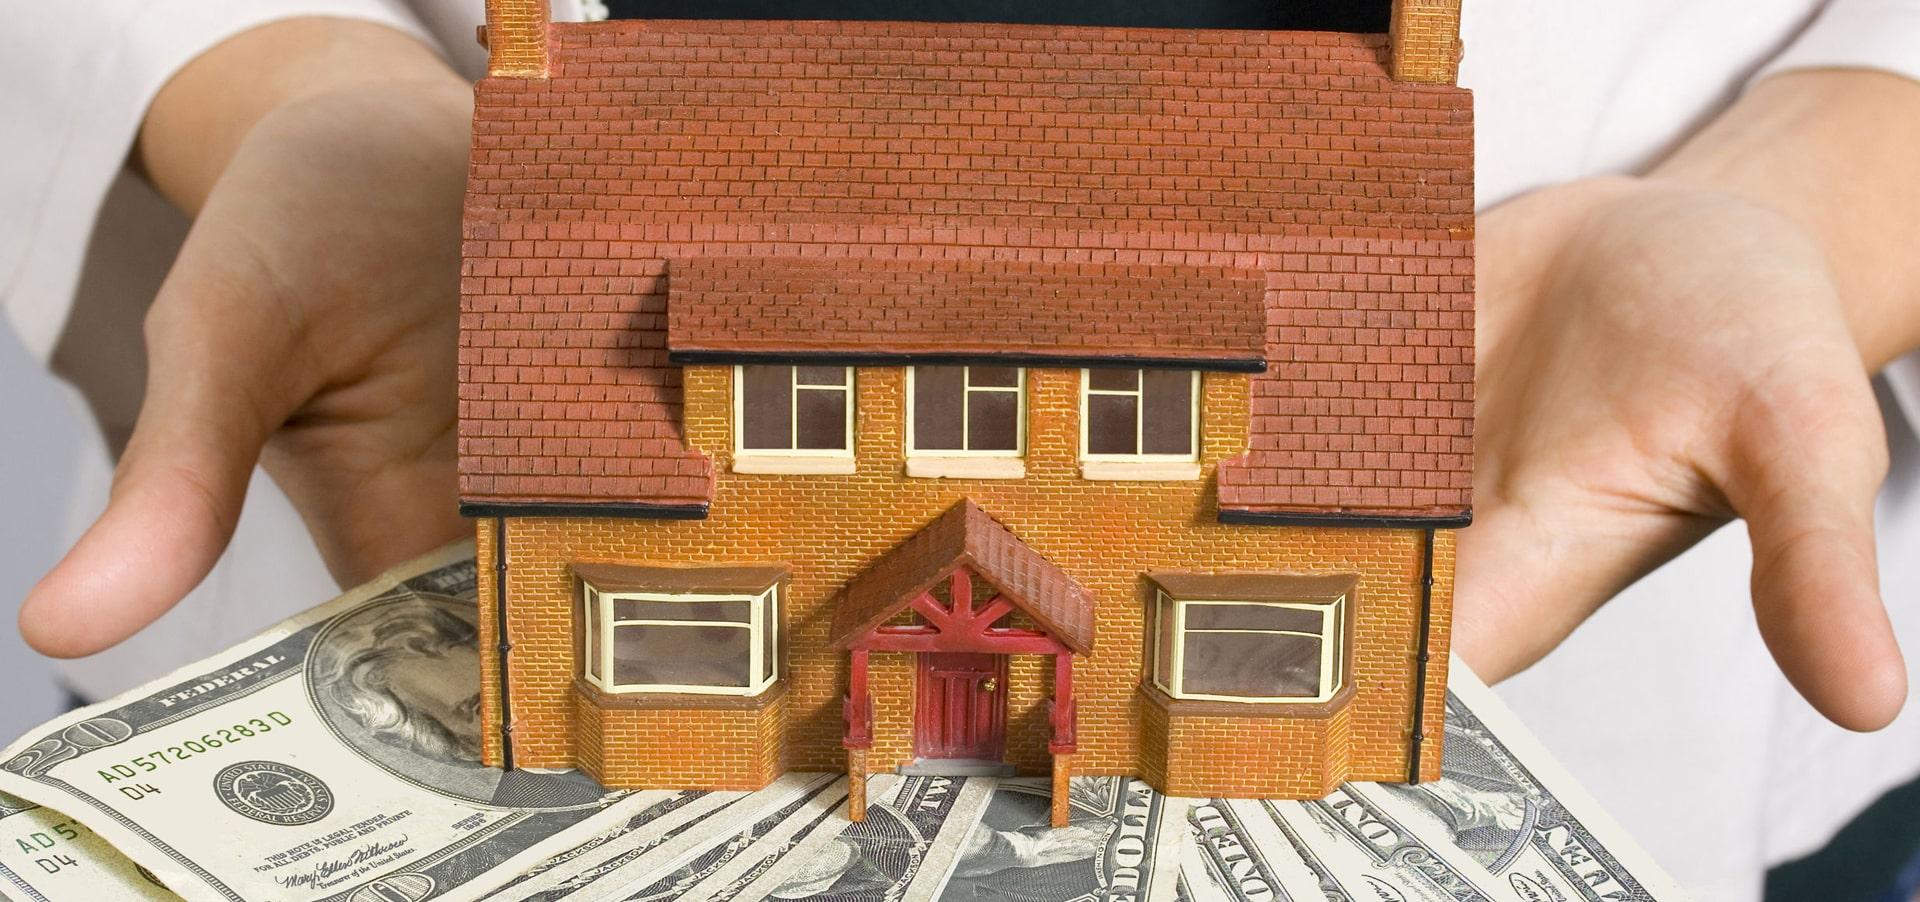 Mortgage-Fraud-Credit-Theft